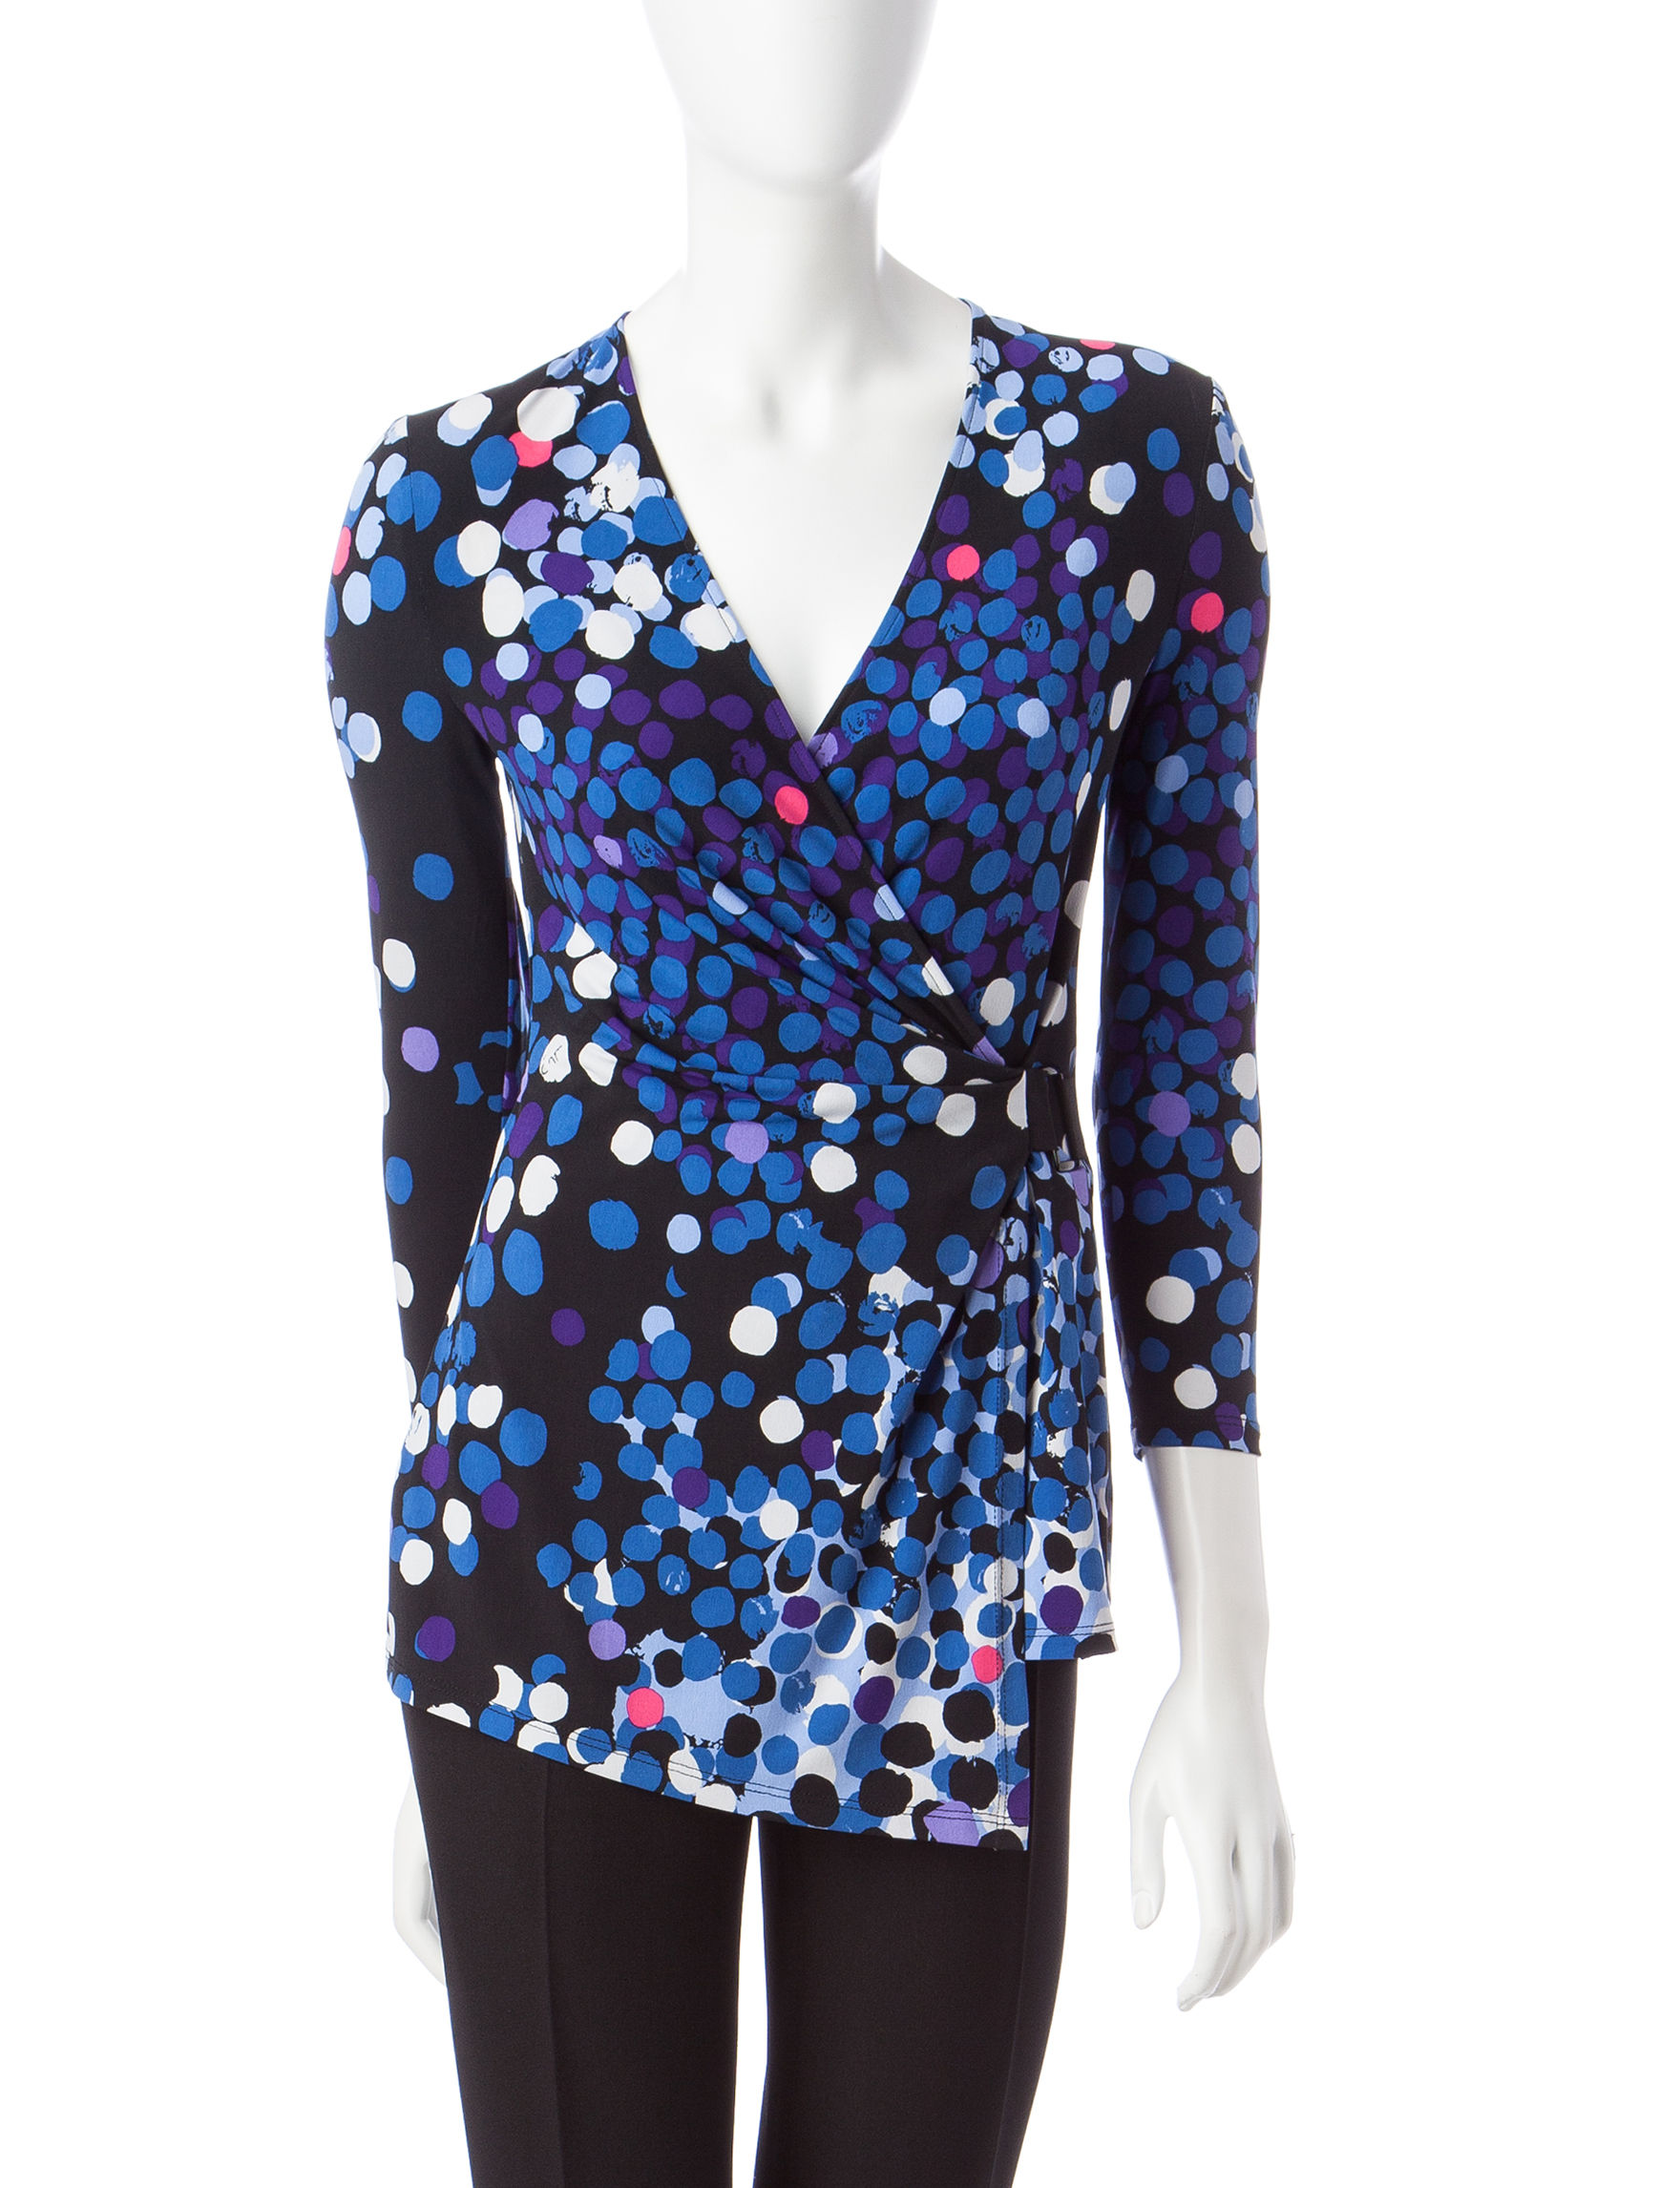 Anne Klein Black / Blue Shirts & Blouses